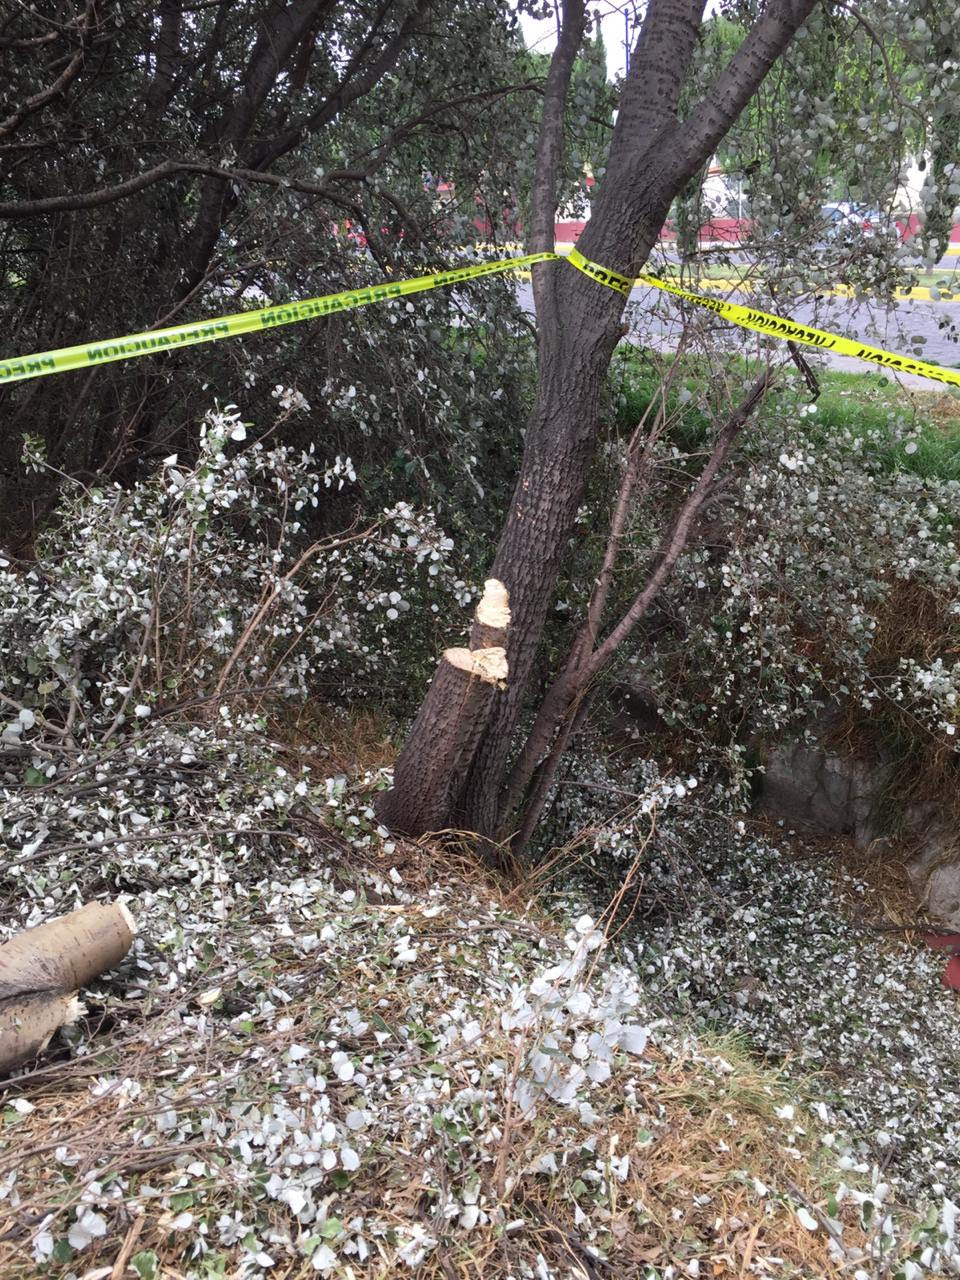 Podan árboles de manera arbitraria en delegación de Toluca